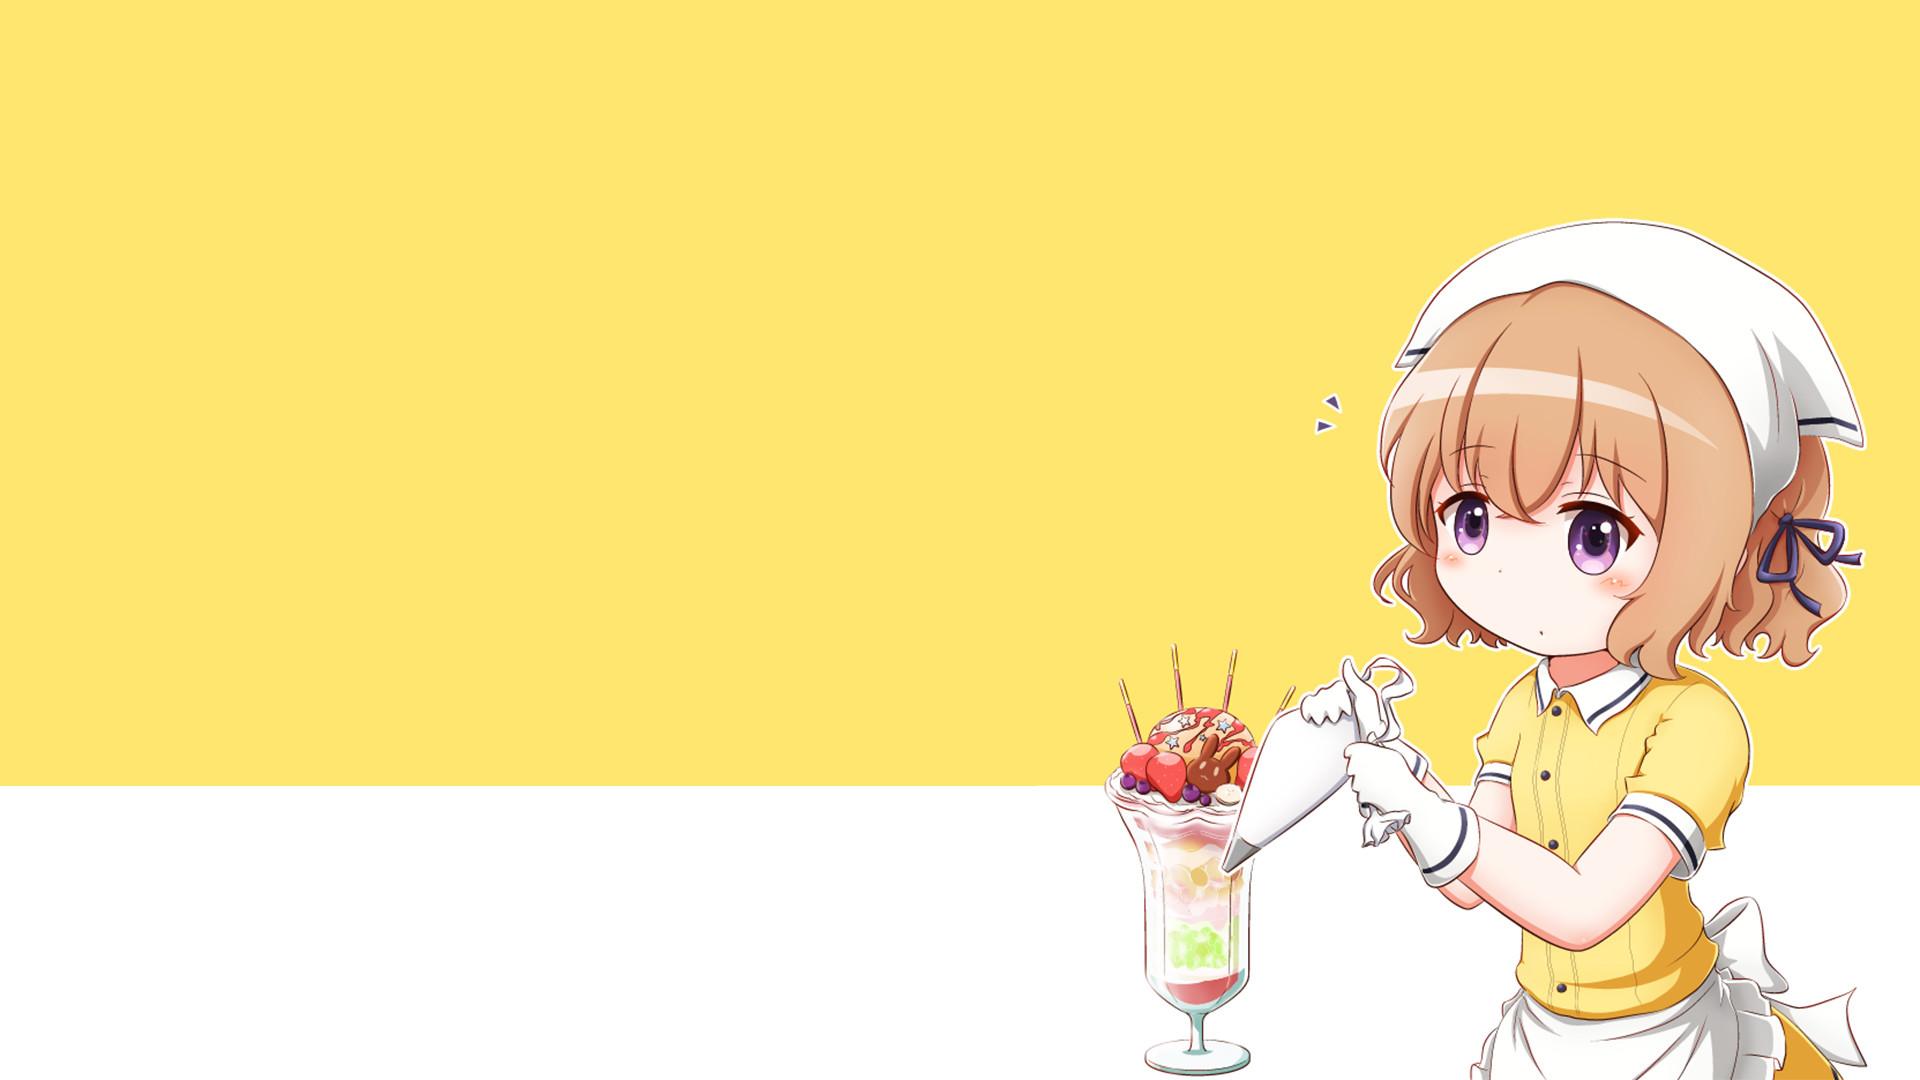 Download 300 Wallpaper Hd Anime Blend S HD